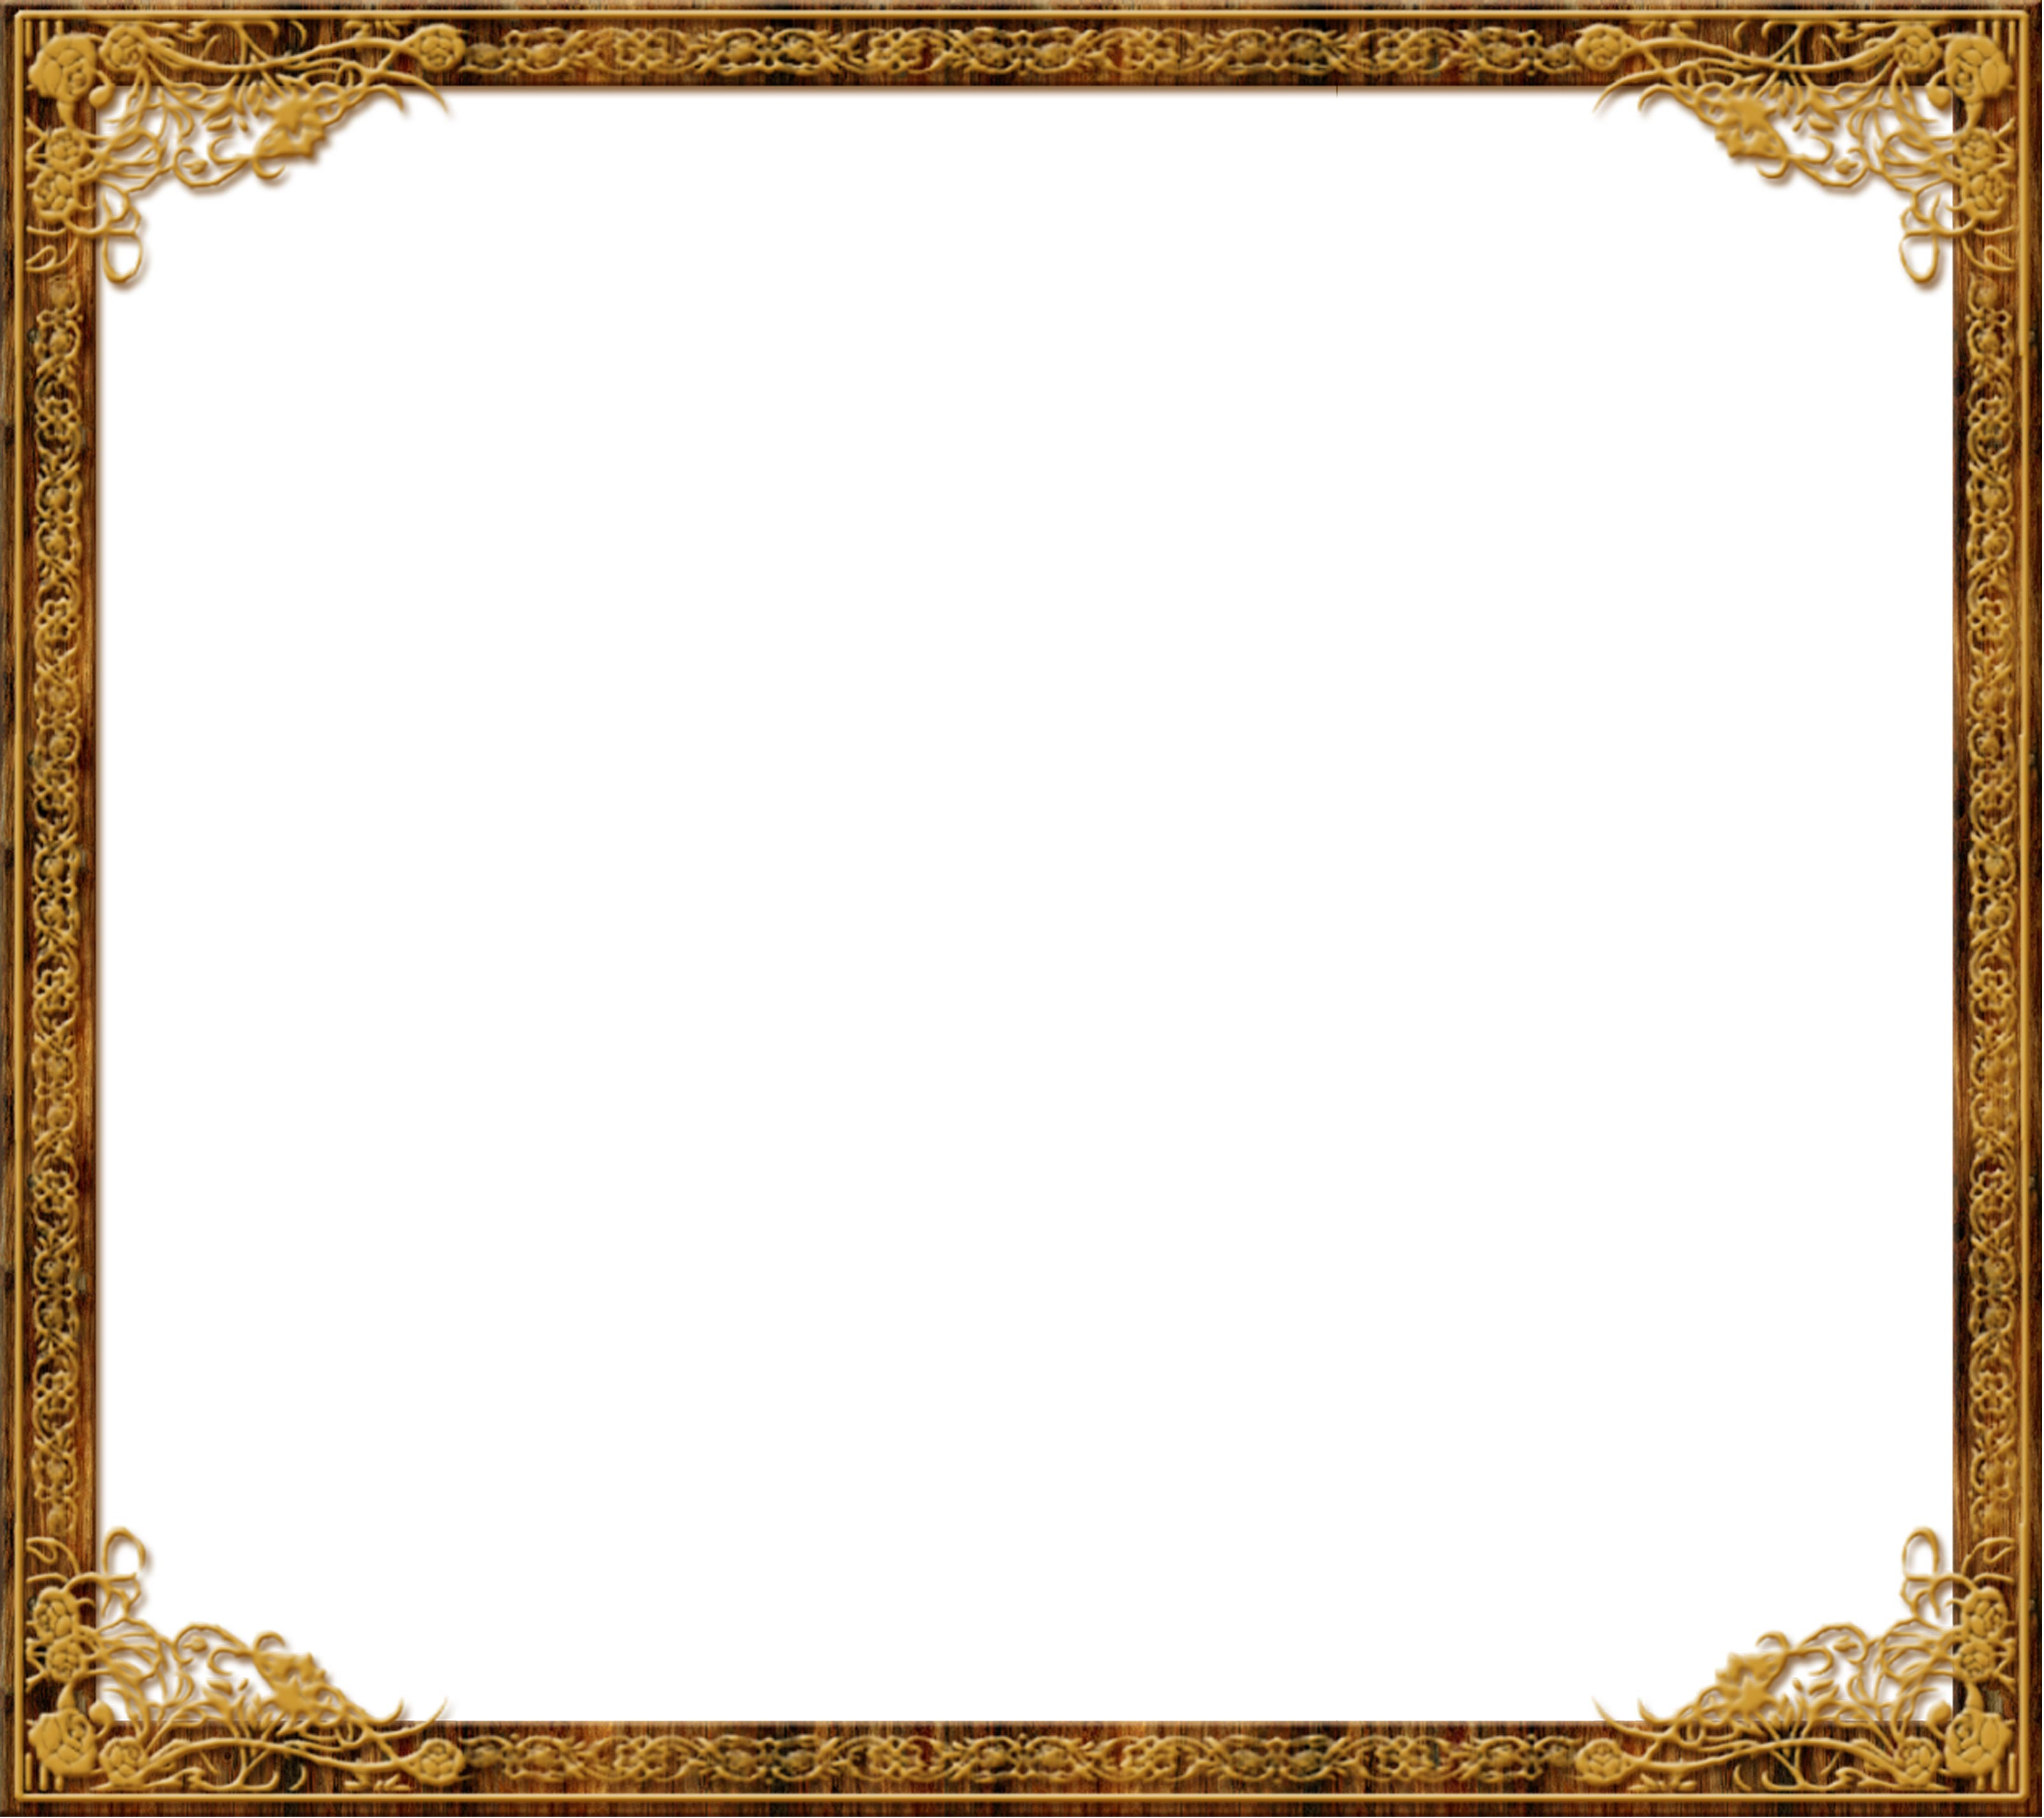 Frame Wallpaper Free Download